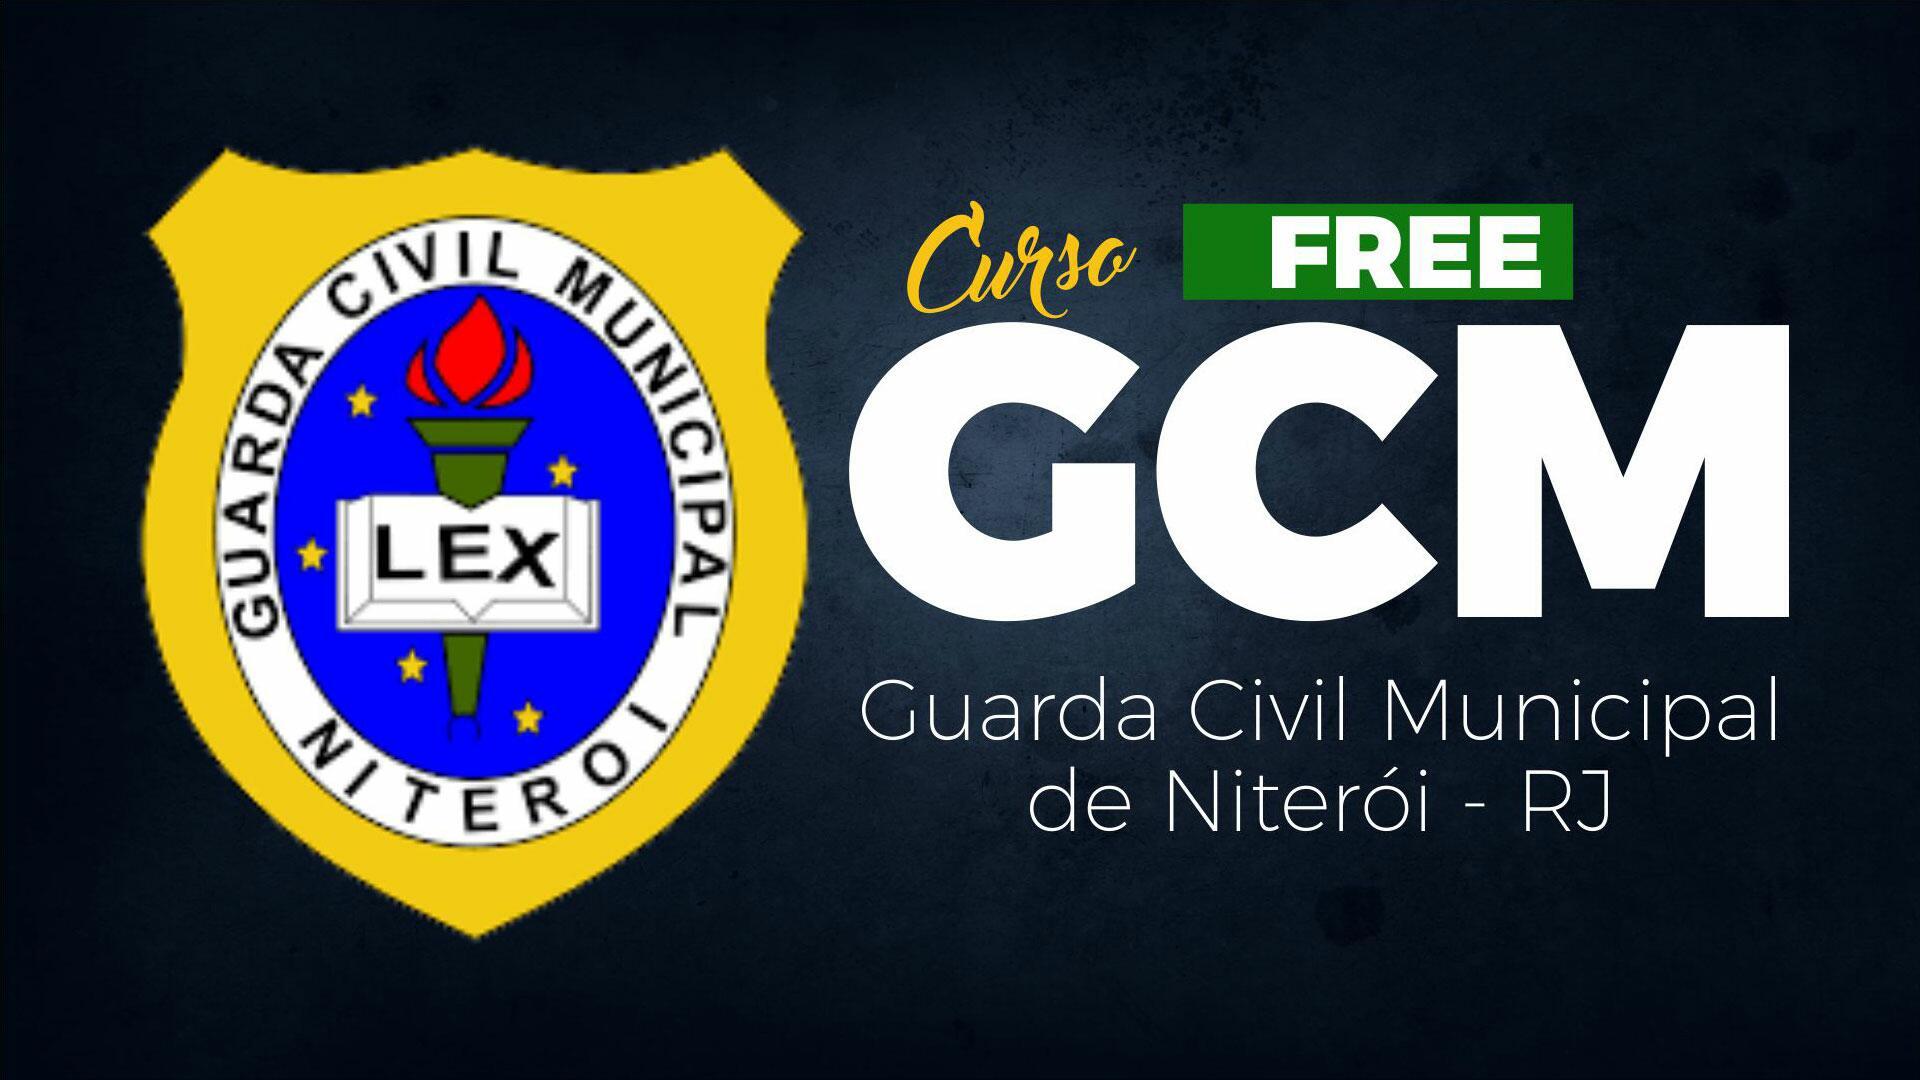 Guarda Civil Municipal de Niterói - RJ - GRATUITO